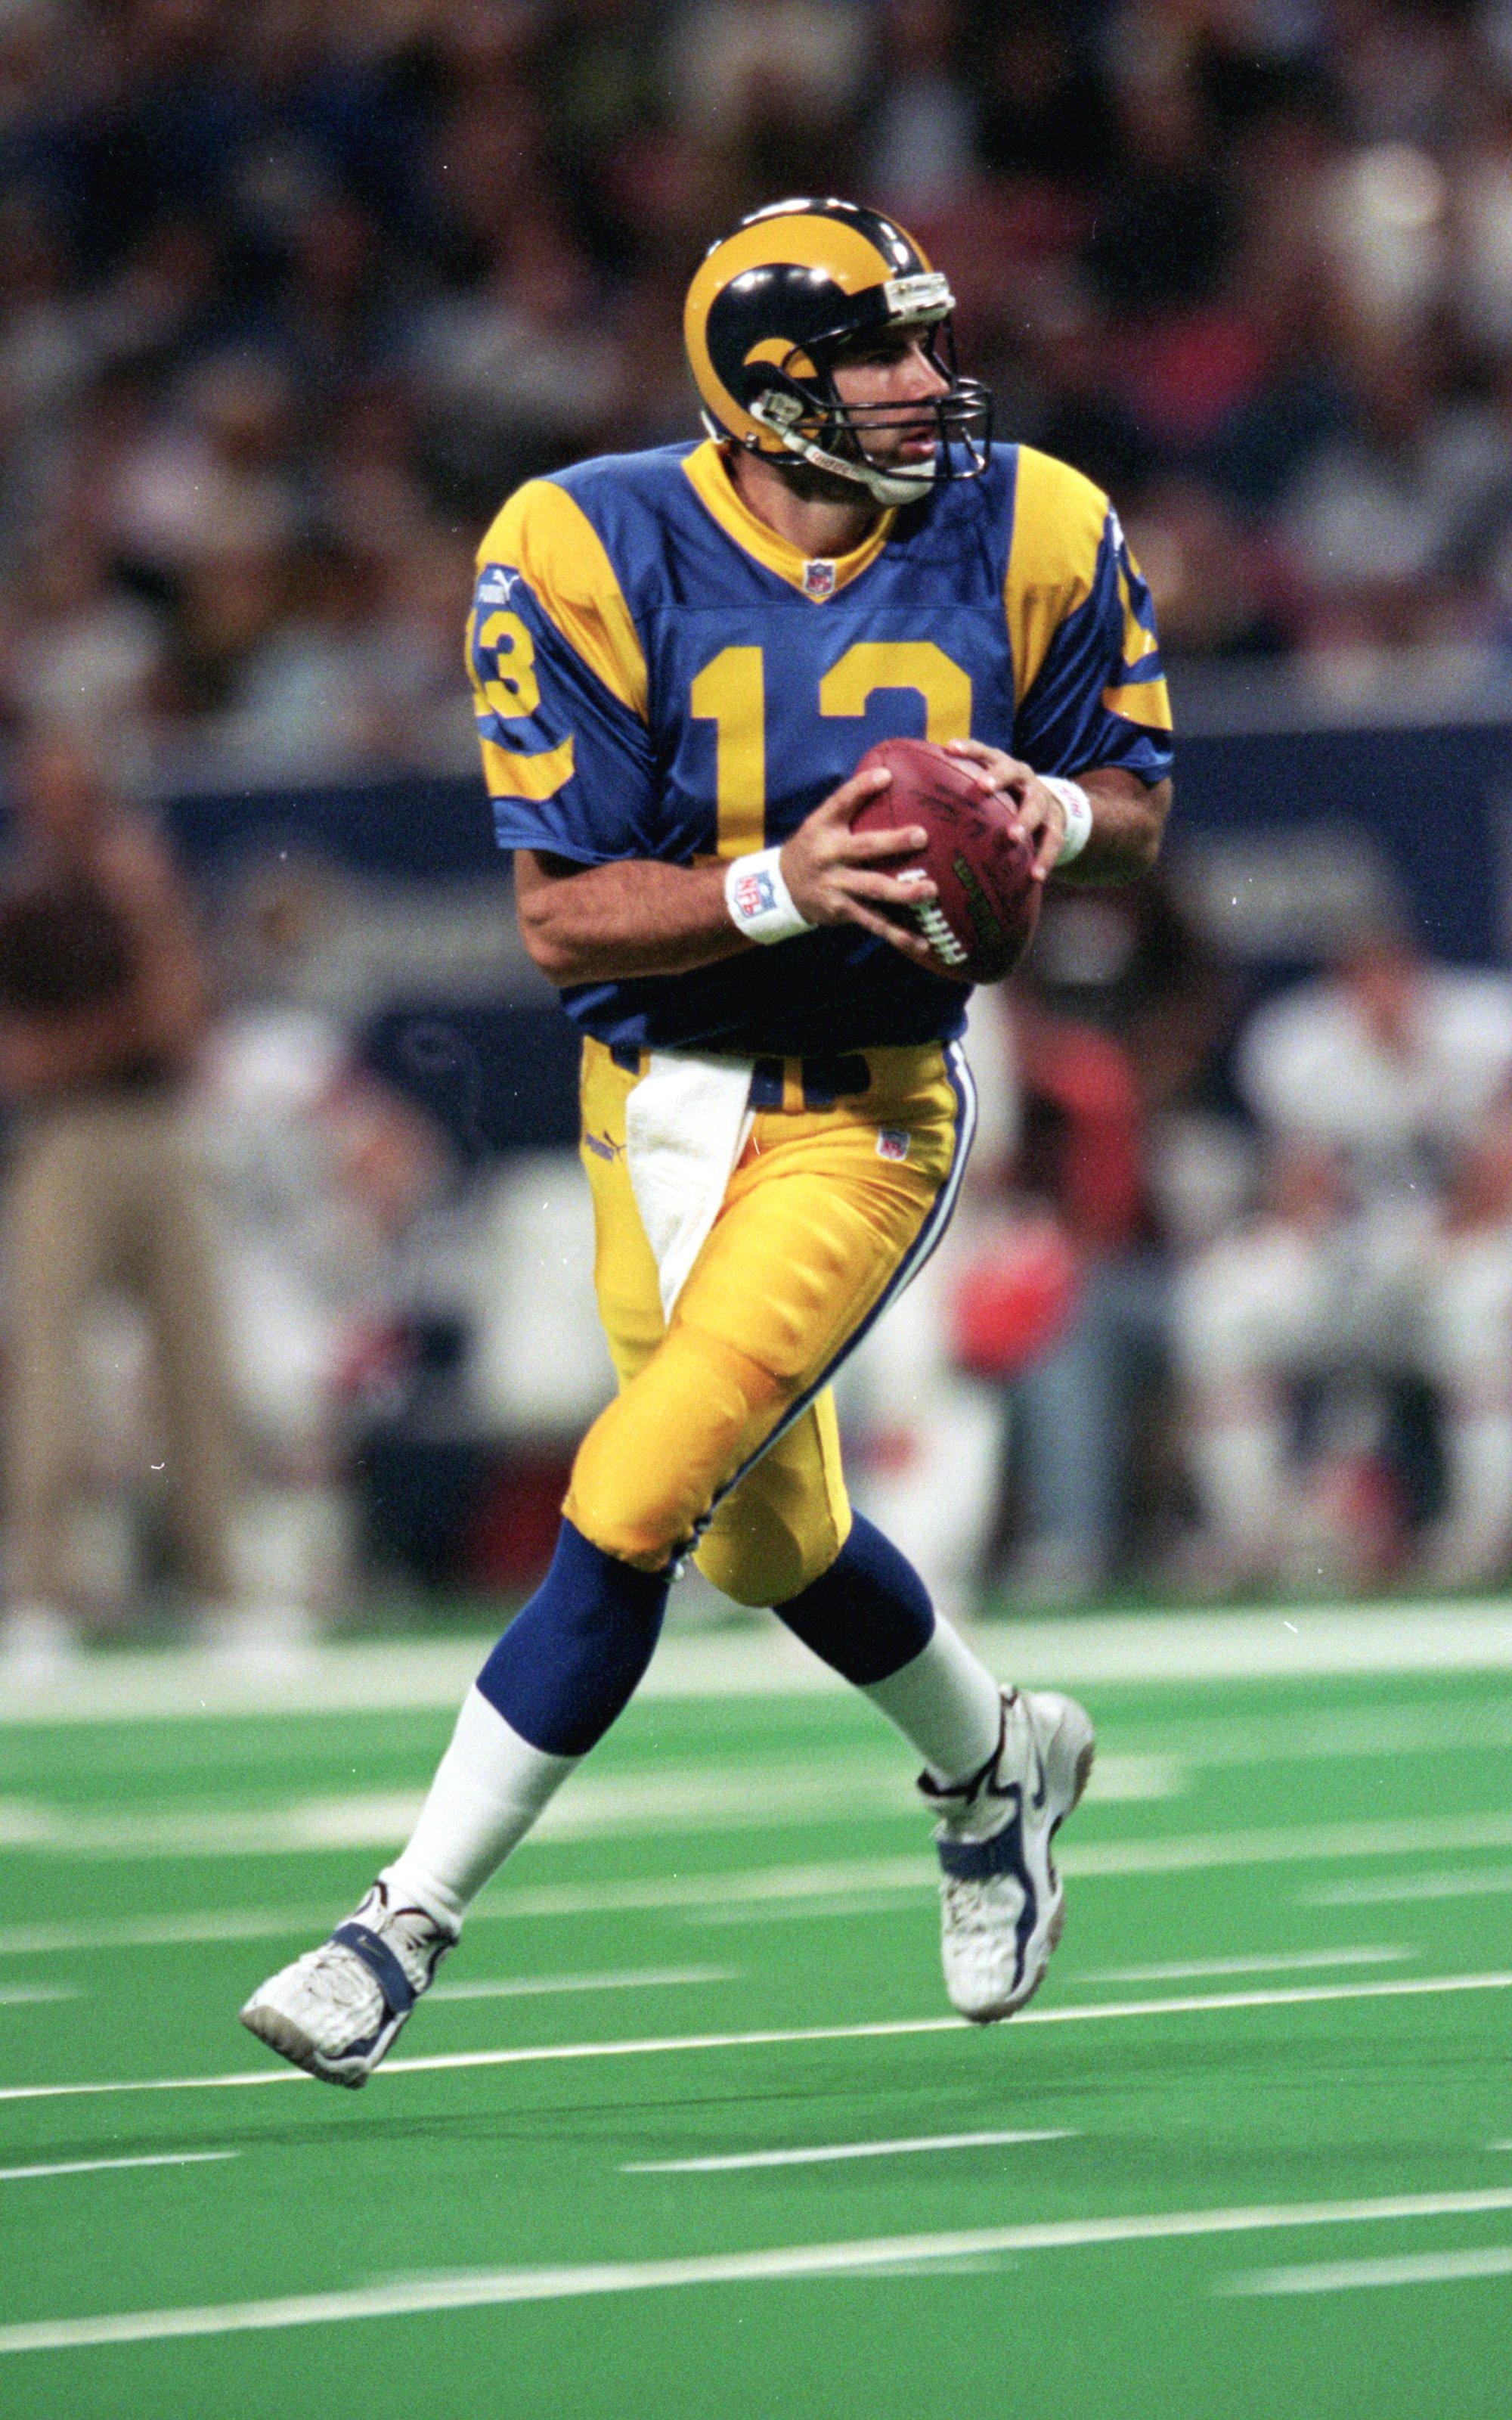 Former St. Louis Rams QB Kurt Warner